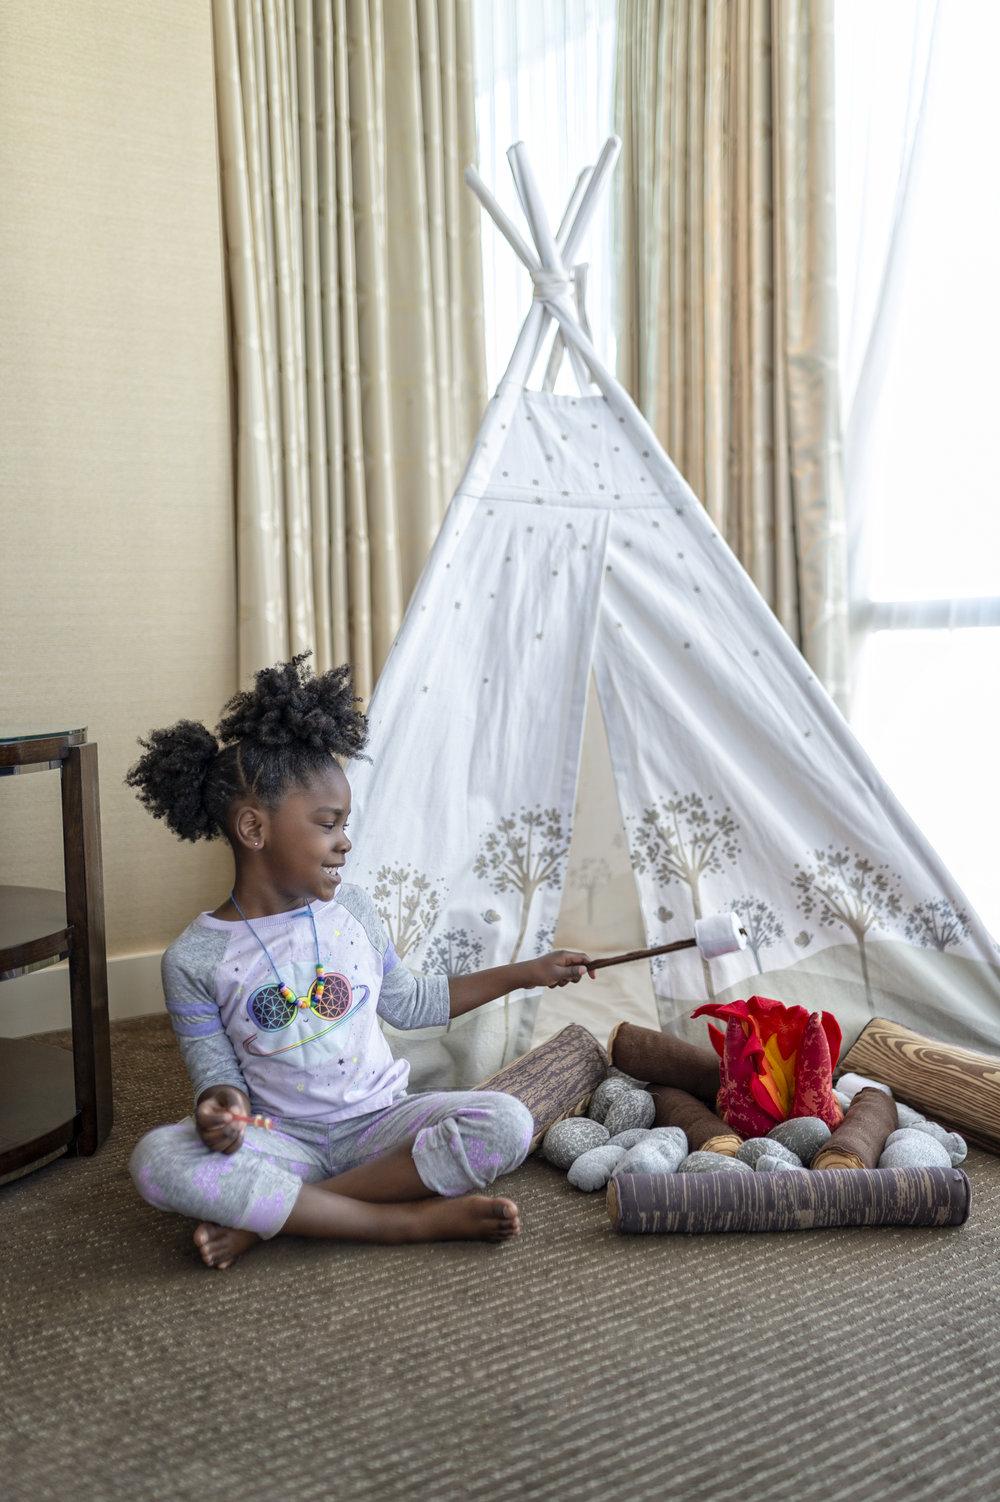 Four-Seasons-Baltimore-Family-Staycation-Kids-ameneties-1.jpg